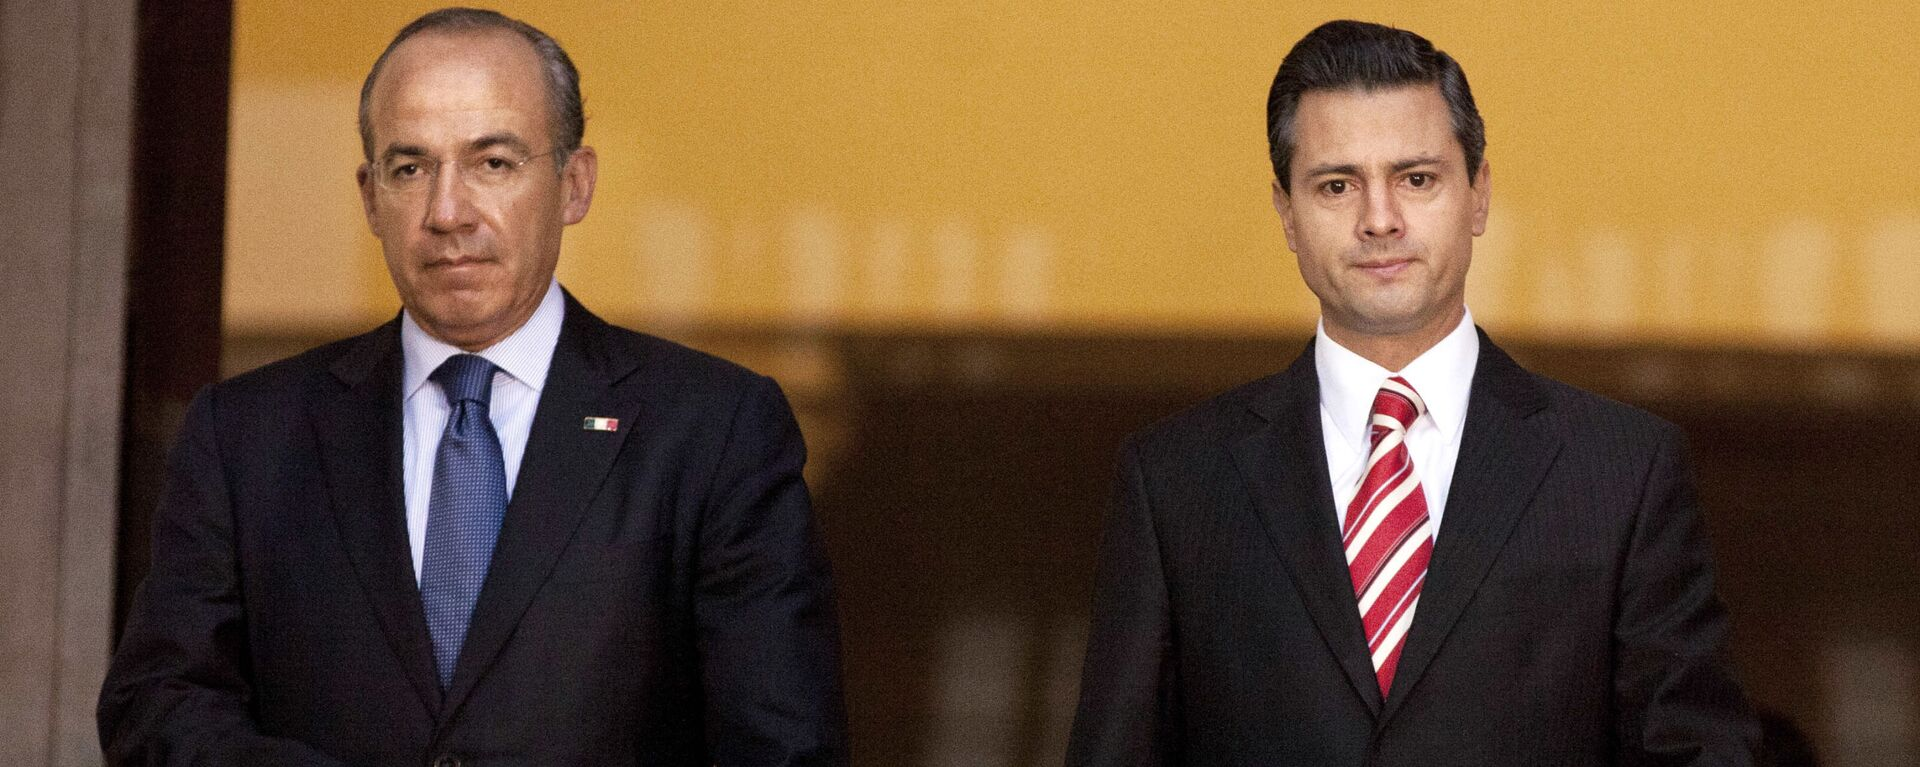 Felipe Calderón Hinojosa y Enrique Peña Nieto, expresidentes de México - Sputnik Mundo, 1920, 17.08.2021